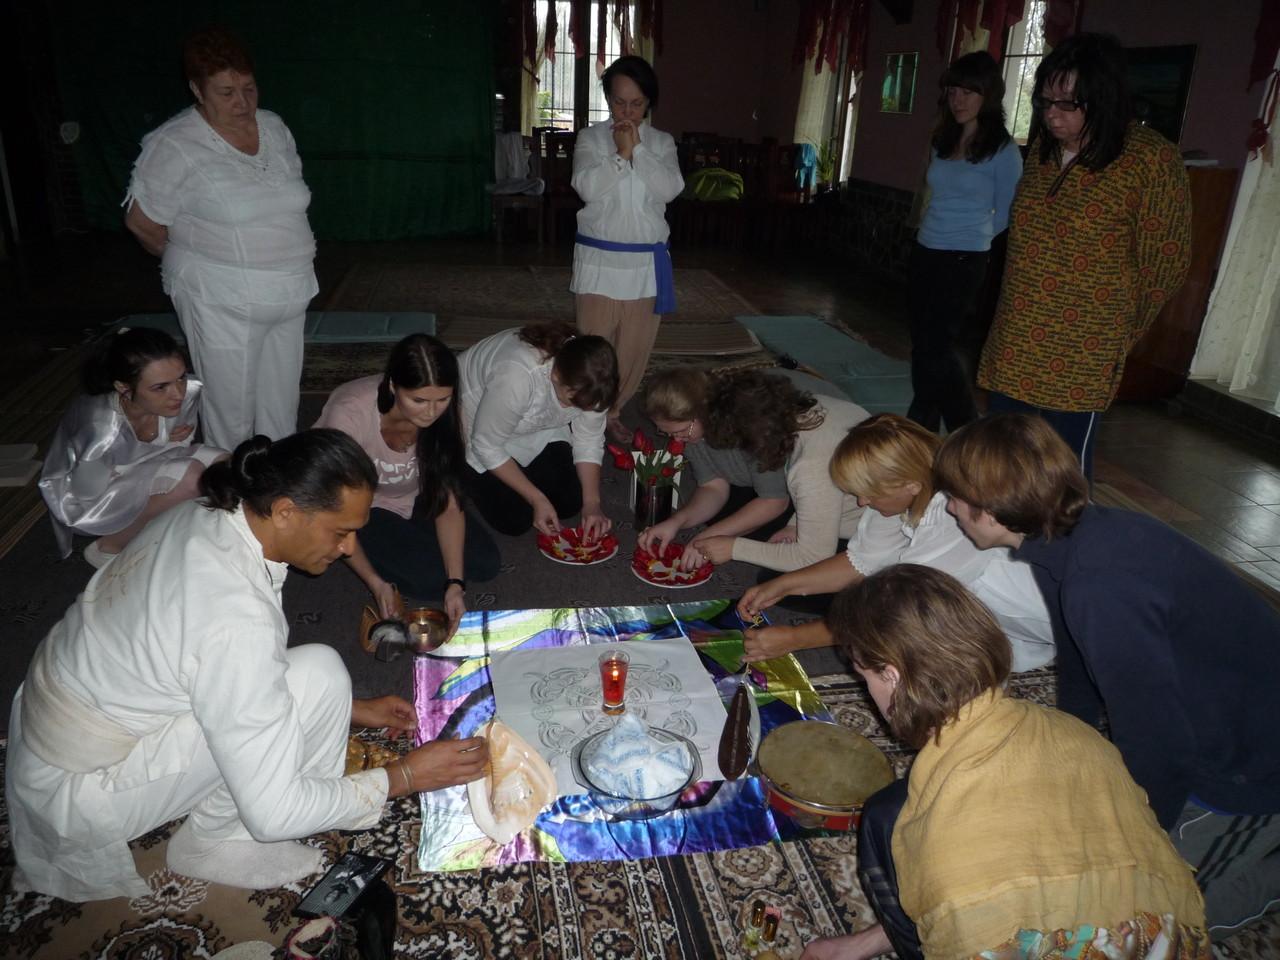 POU UIRA Seminar in Crim, Ukraine 2013